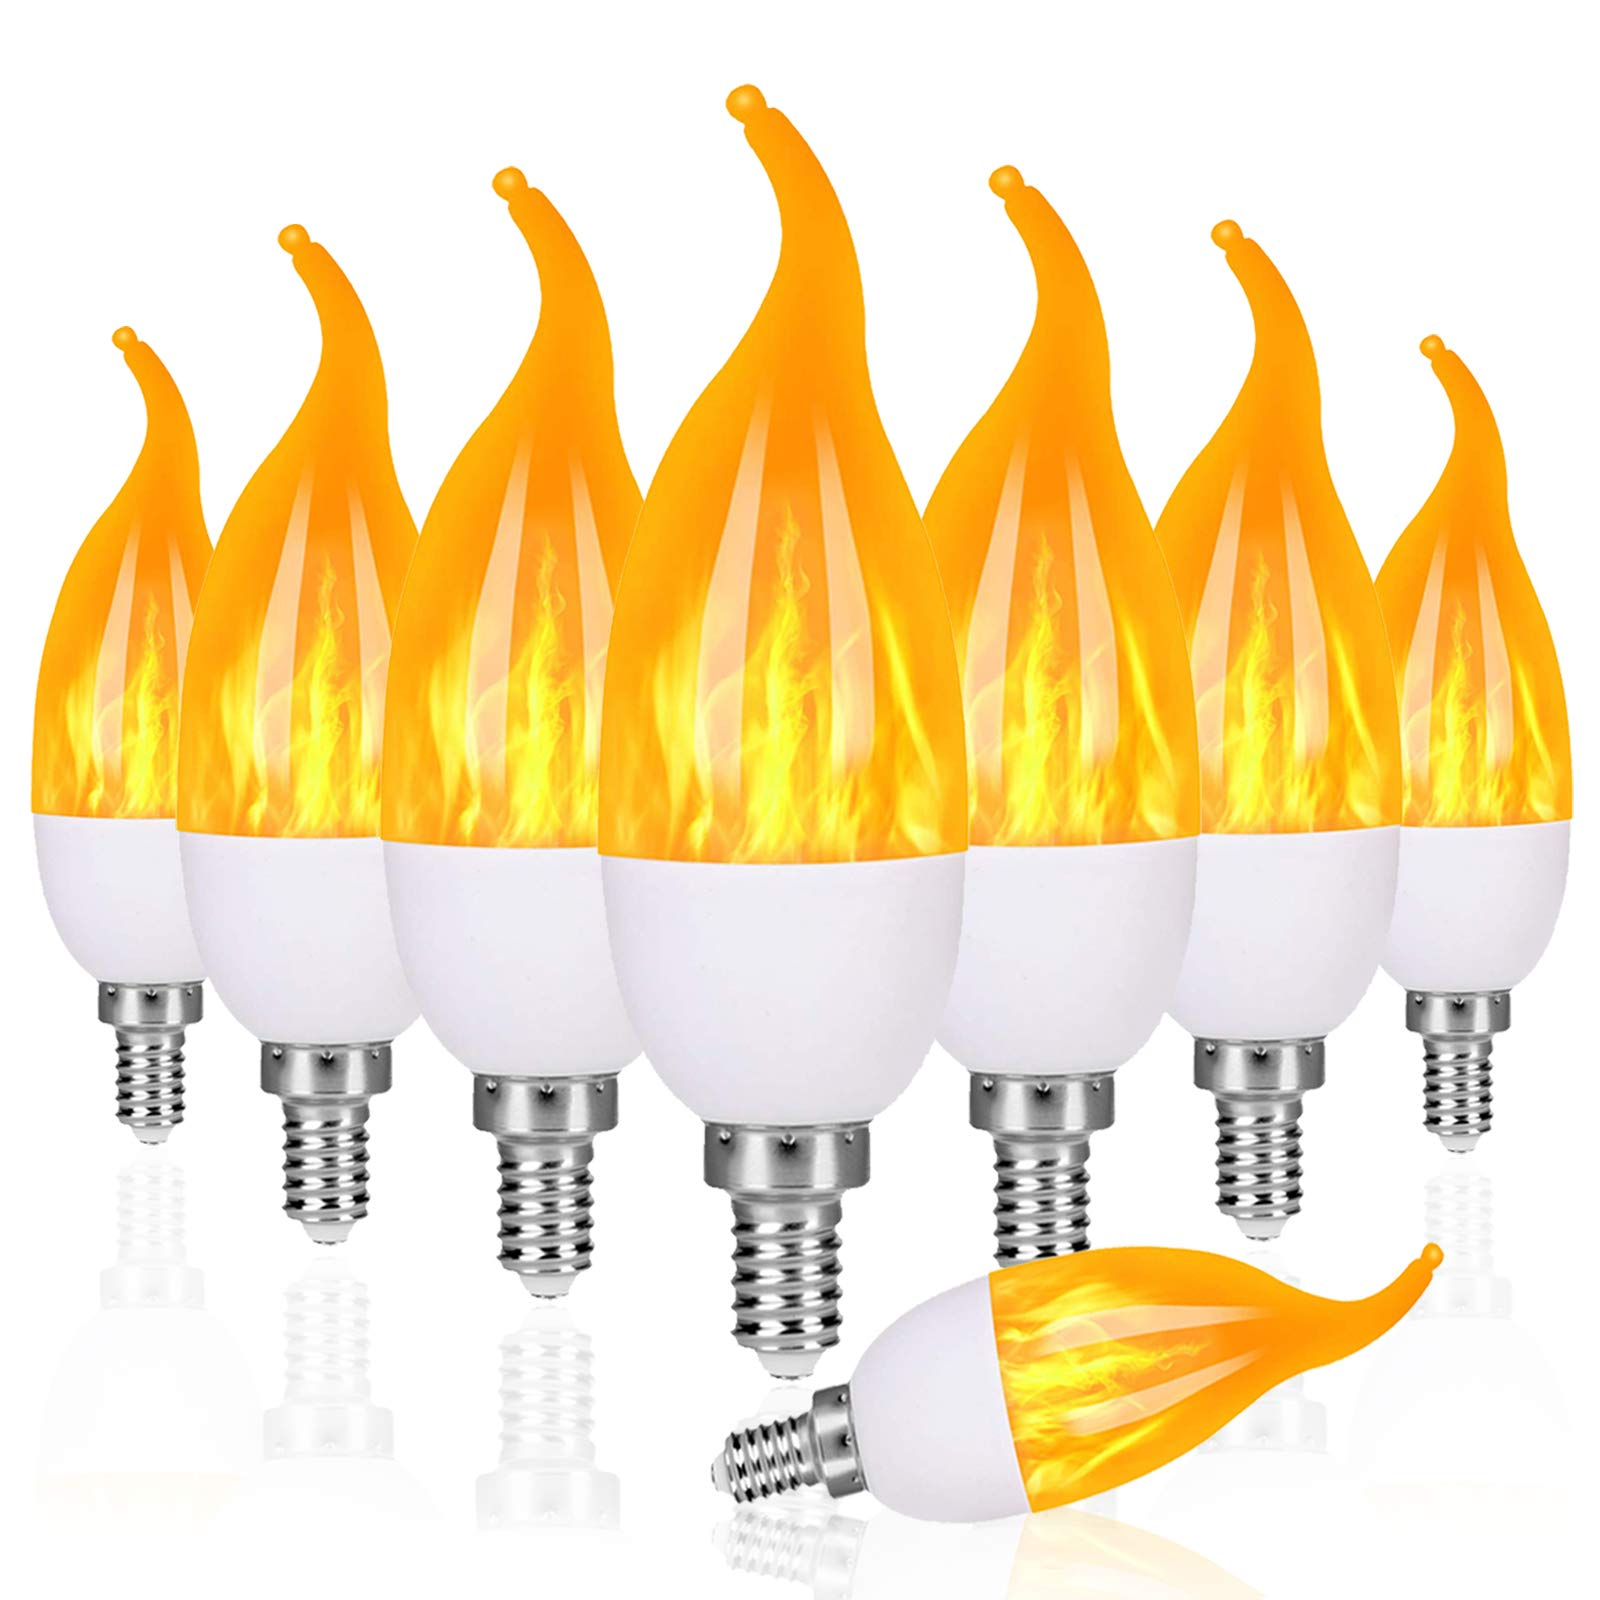 Venforze E12 Flame Bulbs 8 Pack, 3 Mode LED Candelabra Flame Light Bulb 1.2 Watt Warm White Chandelier Flame Bulbs,1800k Candle Light Bulbs, Flame Tip for Christmas Party Decorations